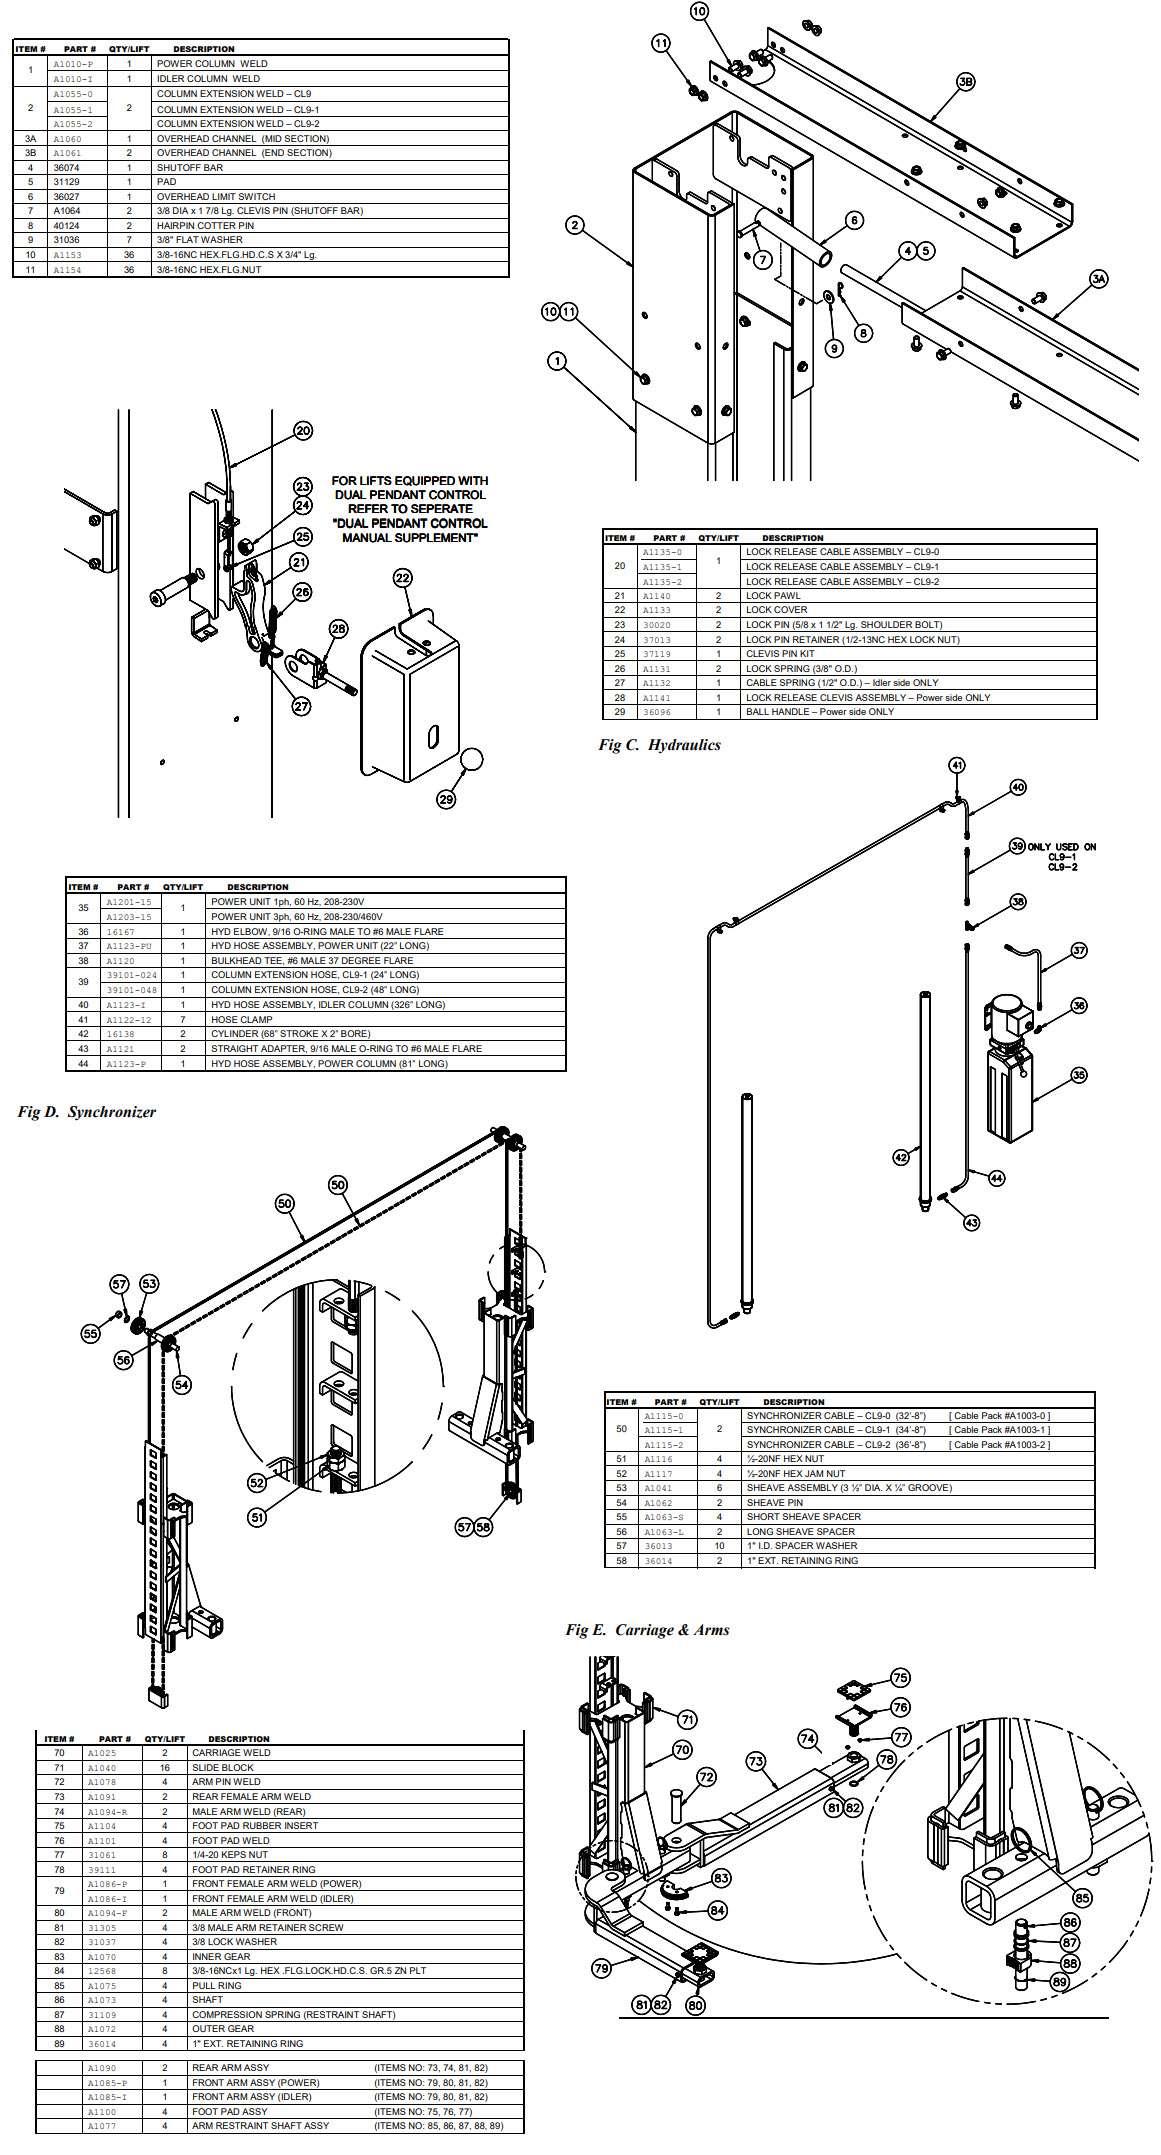 CL9 2 post lift parts list